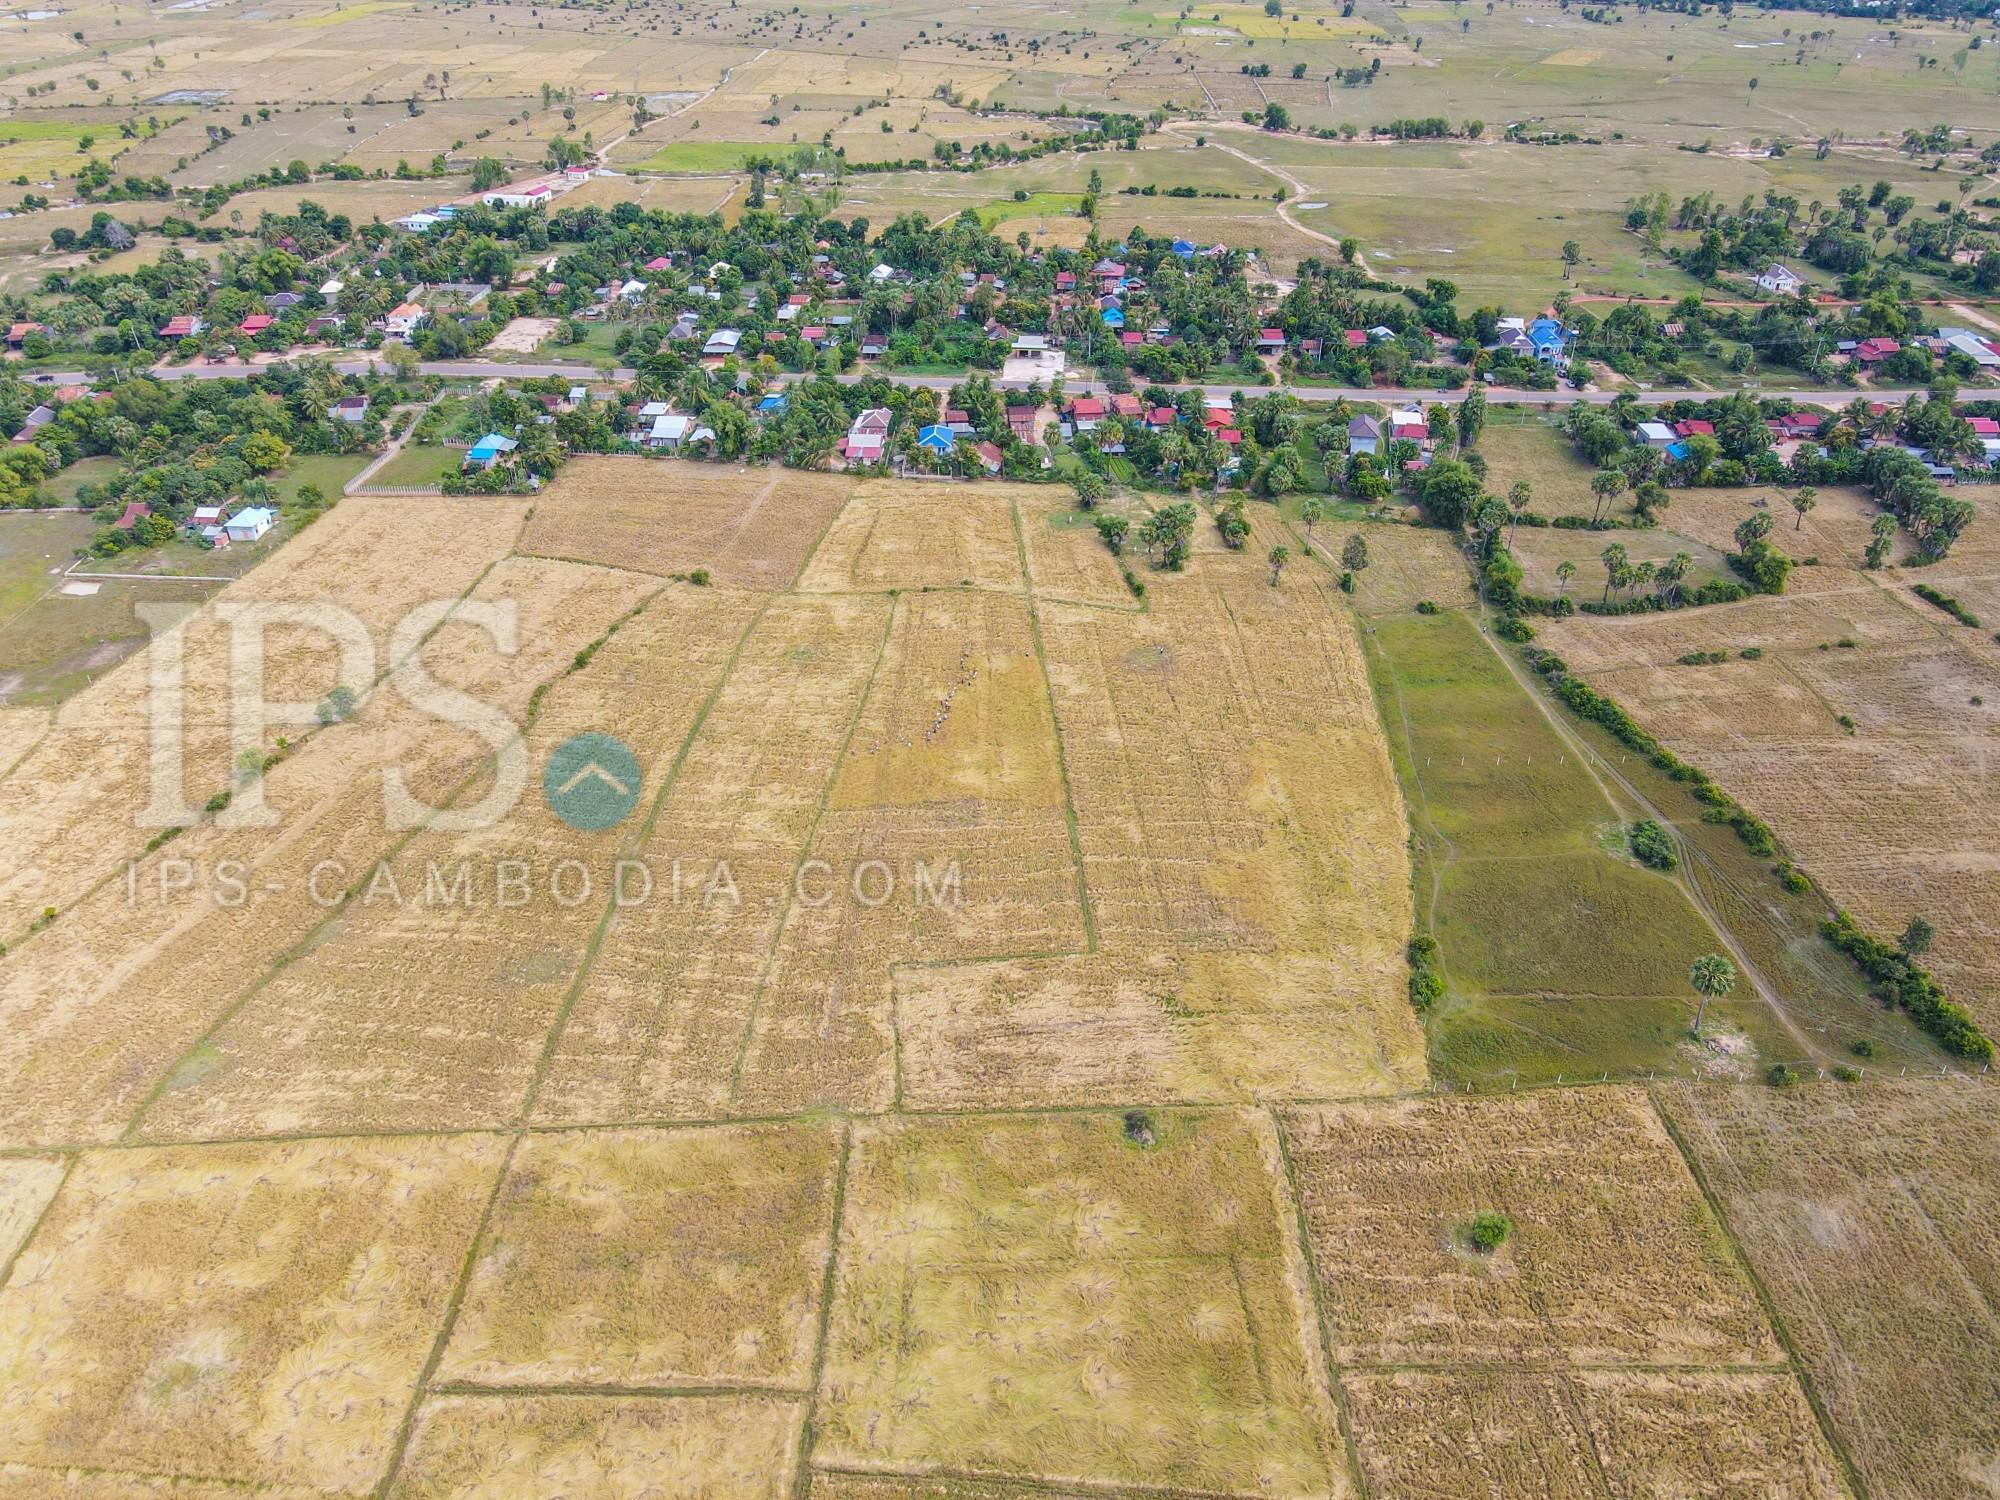 28215Sqm Land For Sale - Bakong, Siem Reap